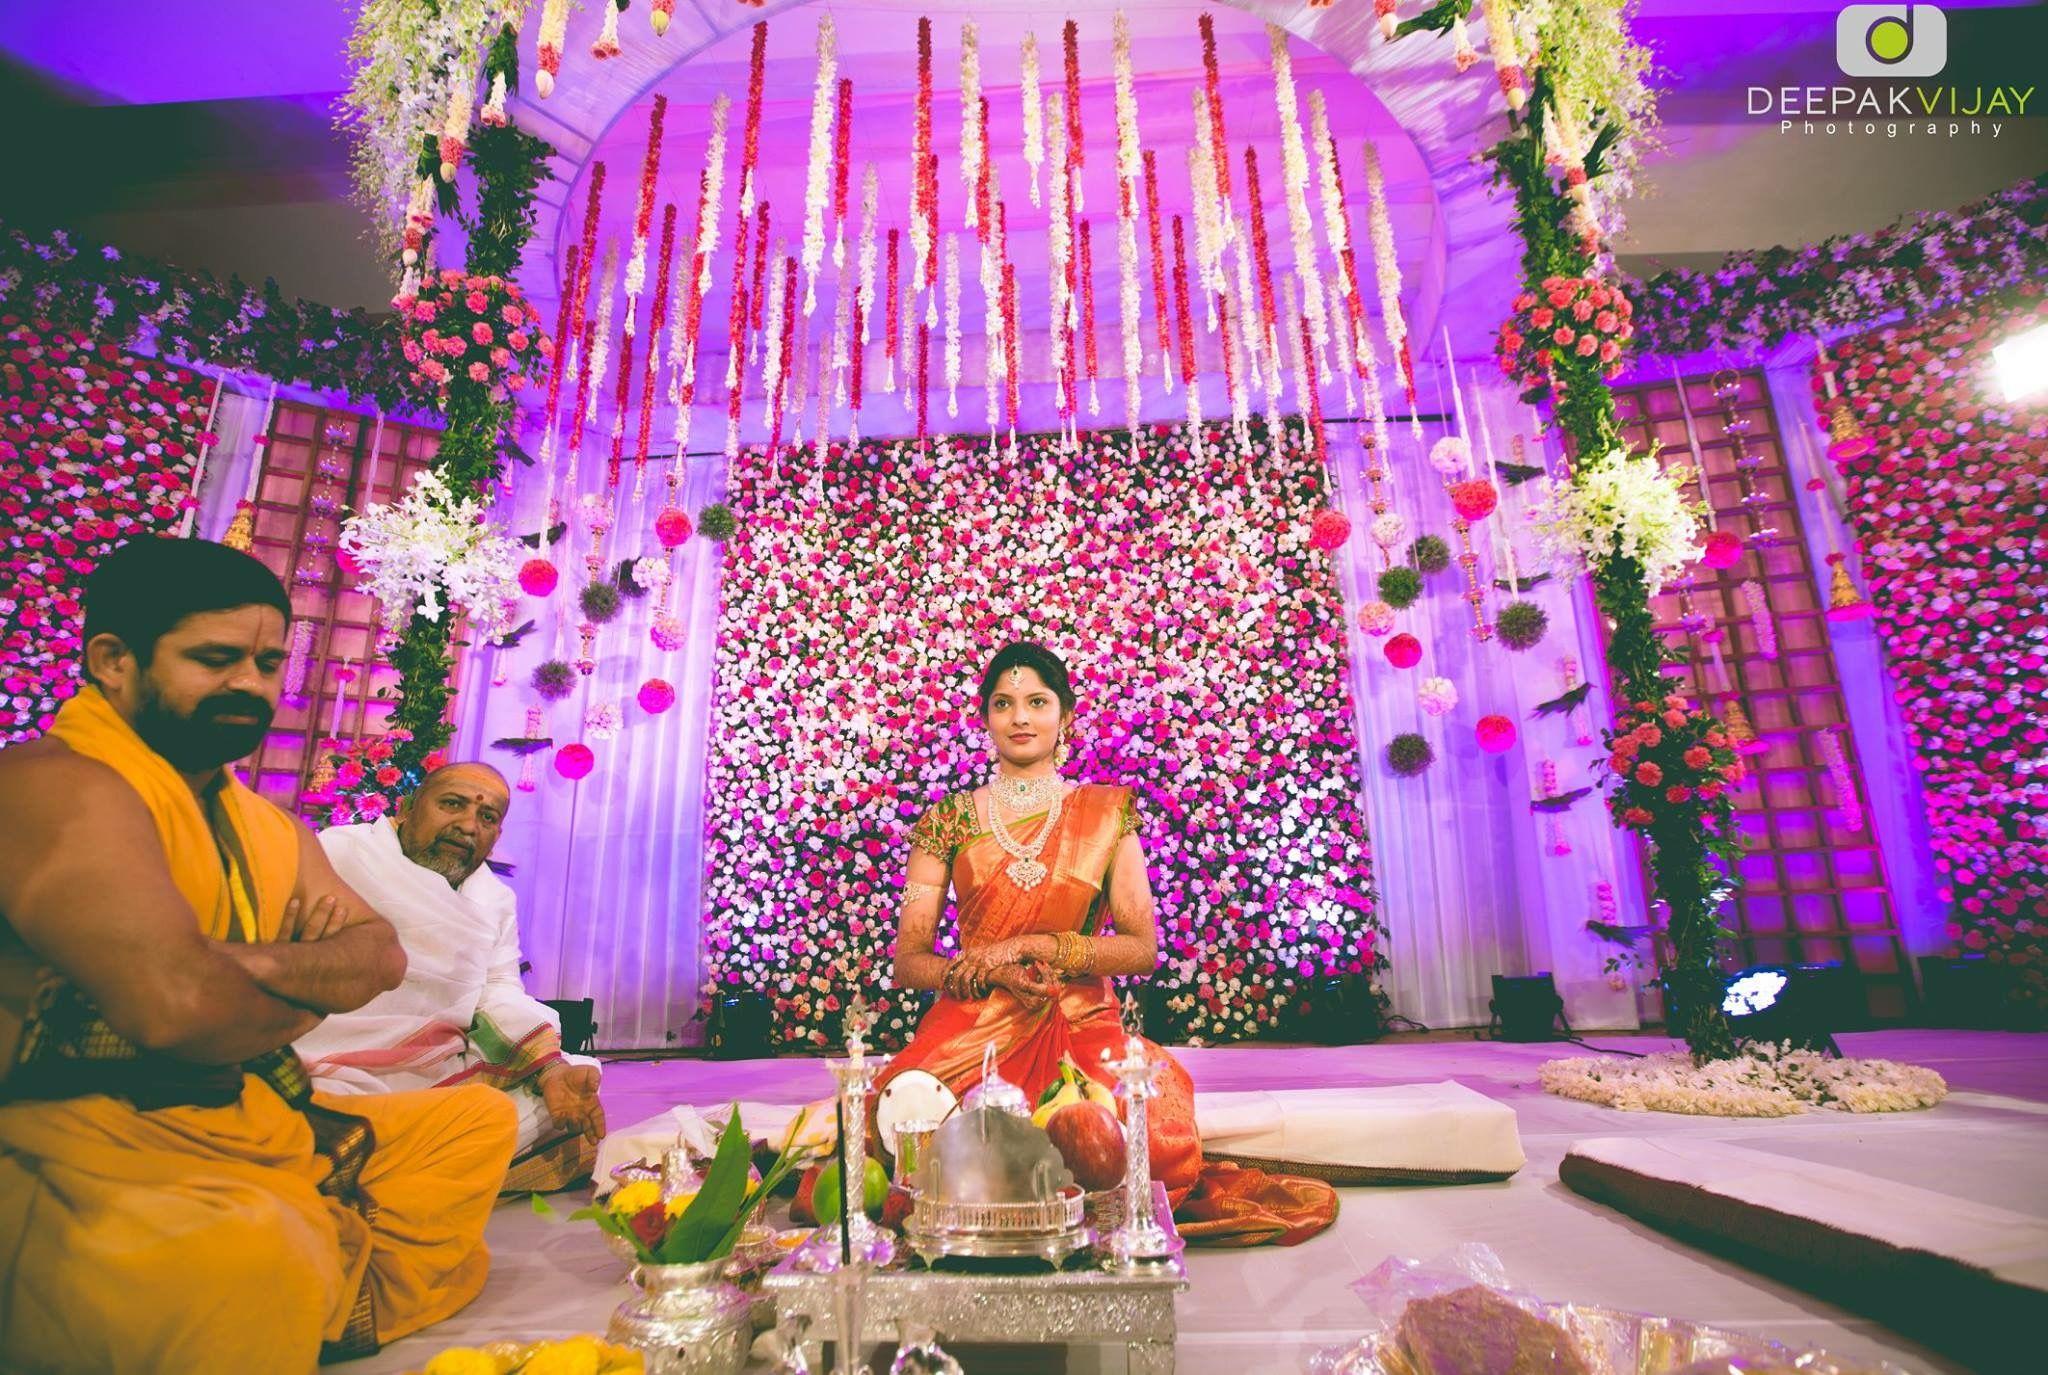 Wedding decorations list  Pin by Sneha Suma on suma  Pinterest  Decoration Wedding and